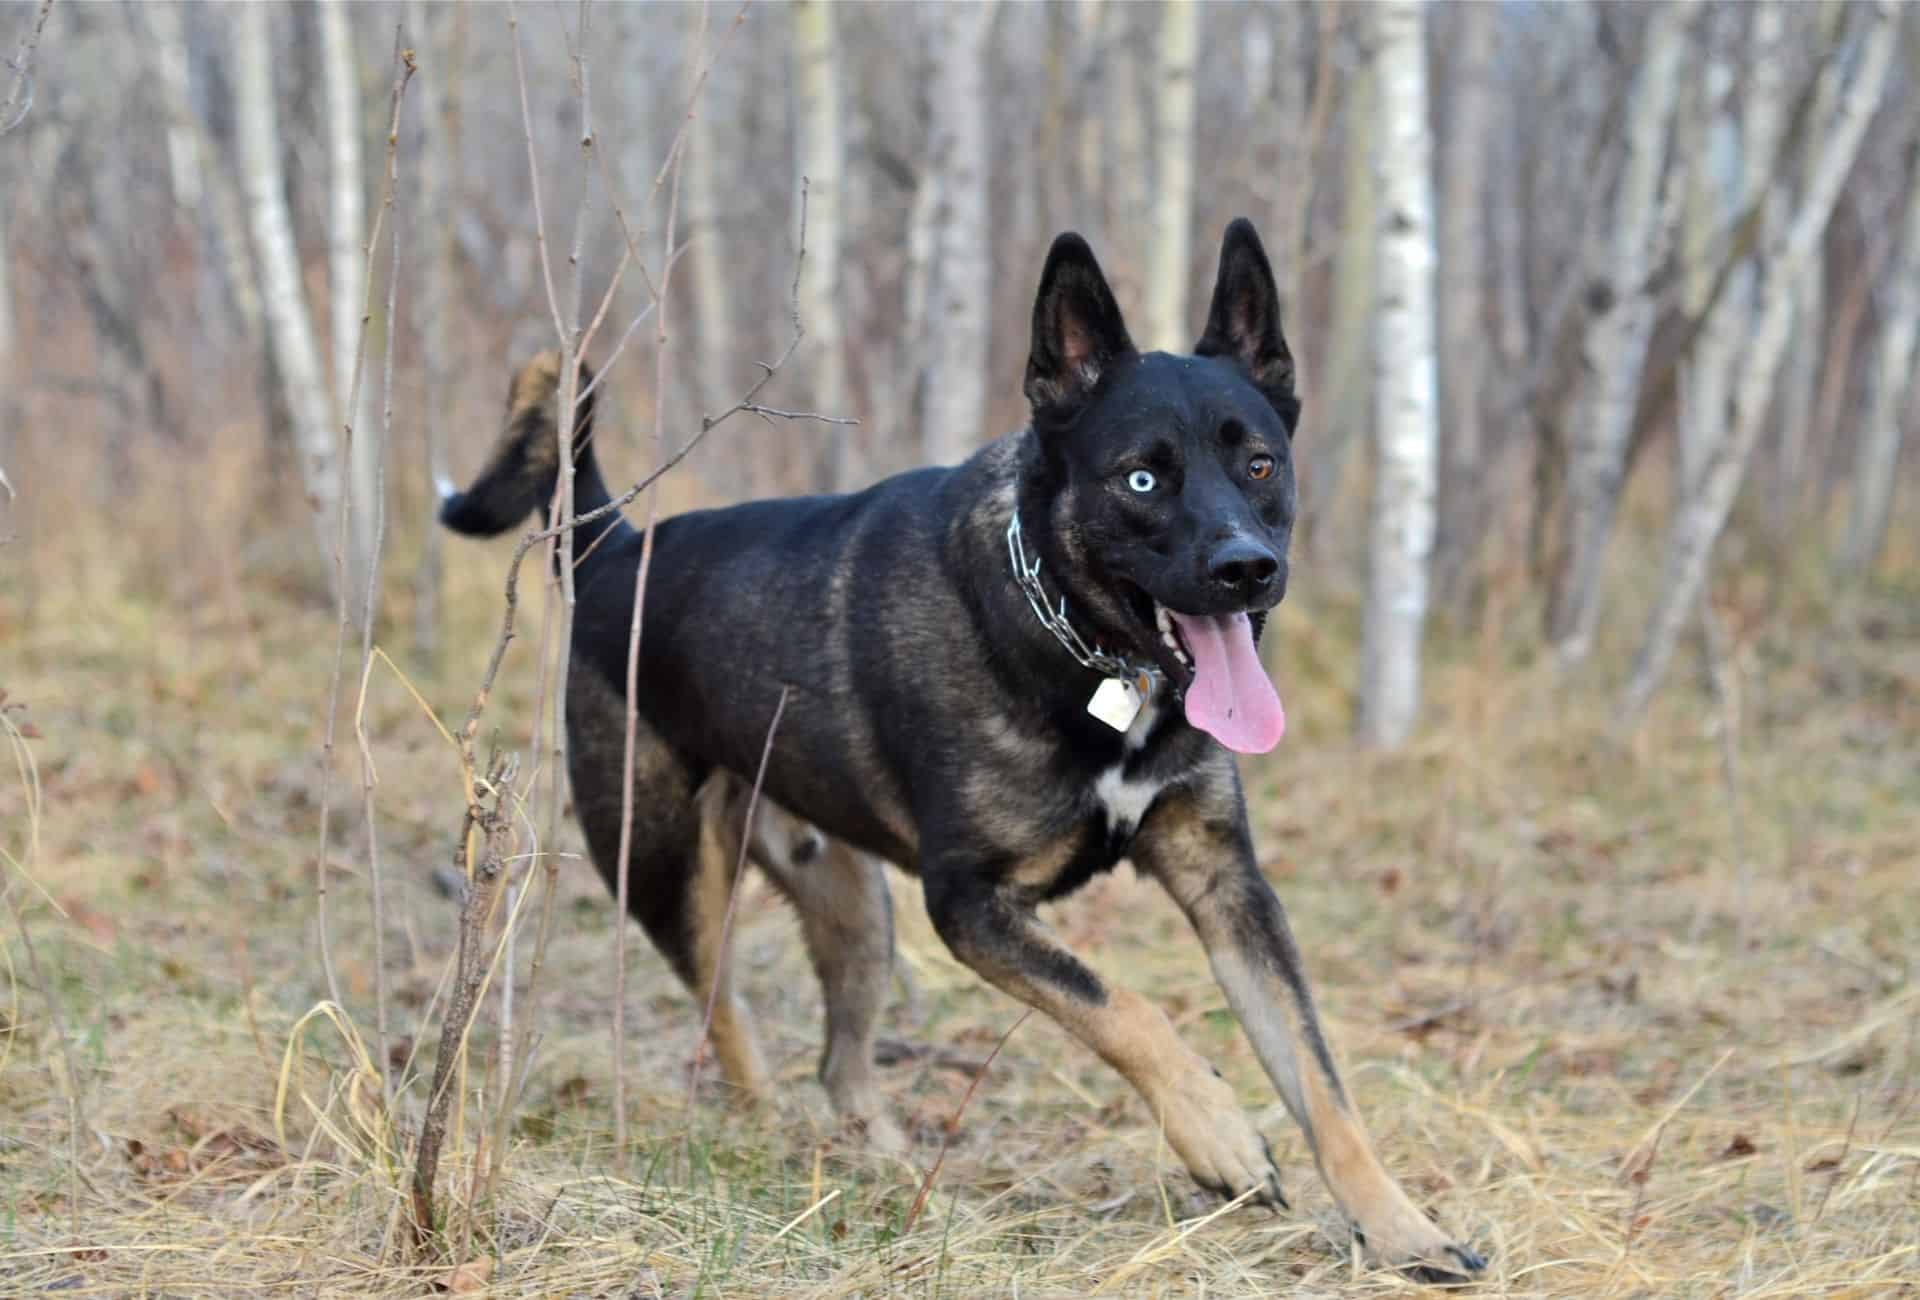 Husky German Shepherd mix with heterochromatic eyes runs around in the forest.